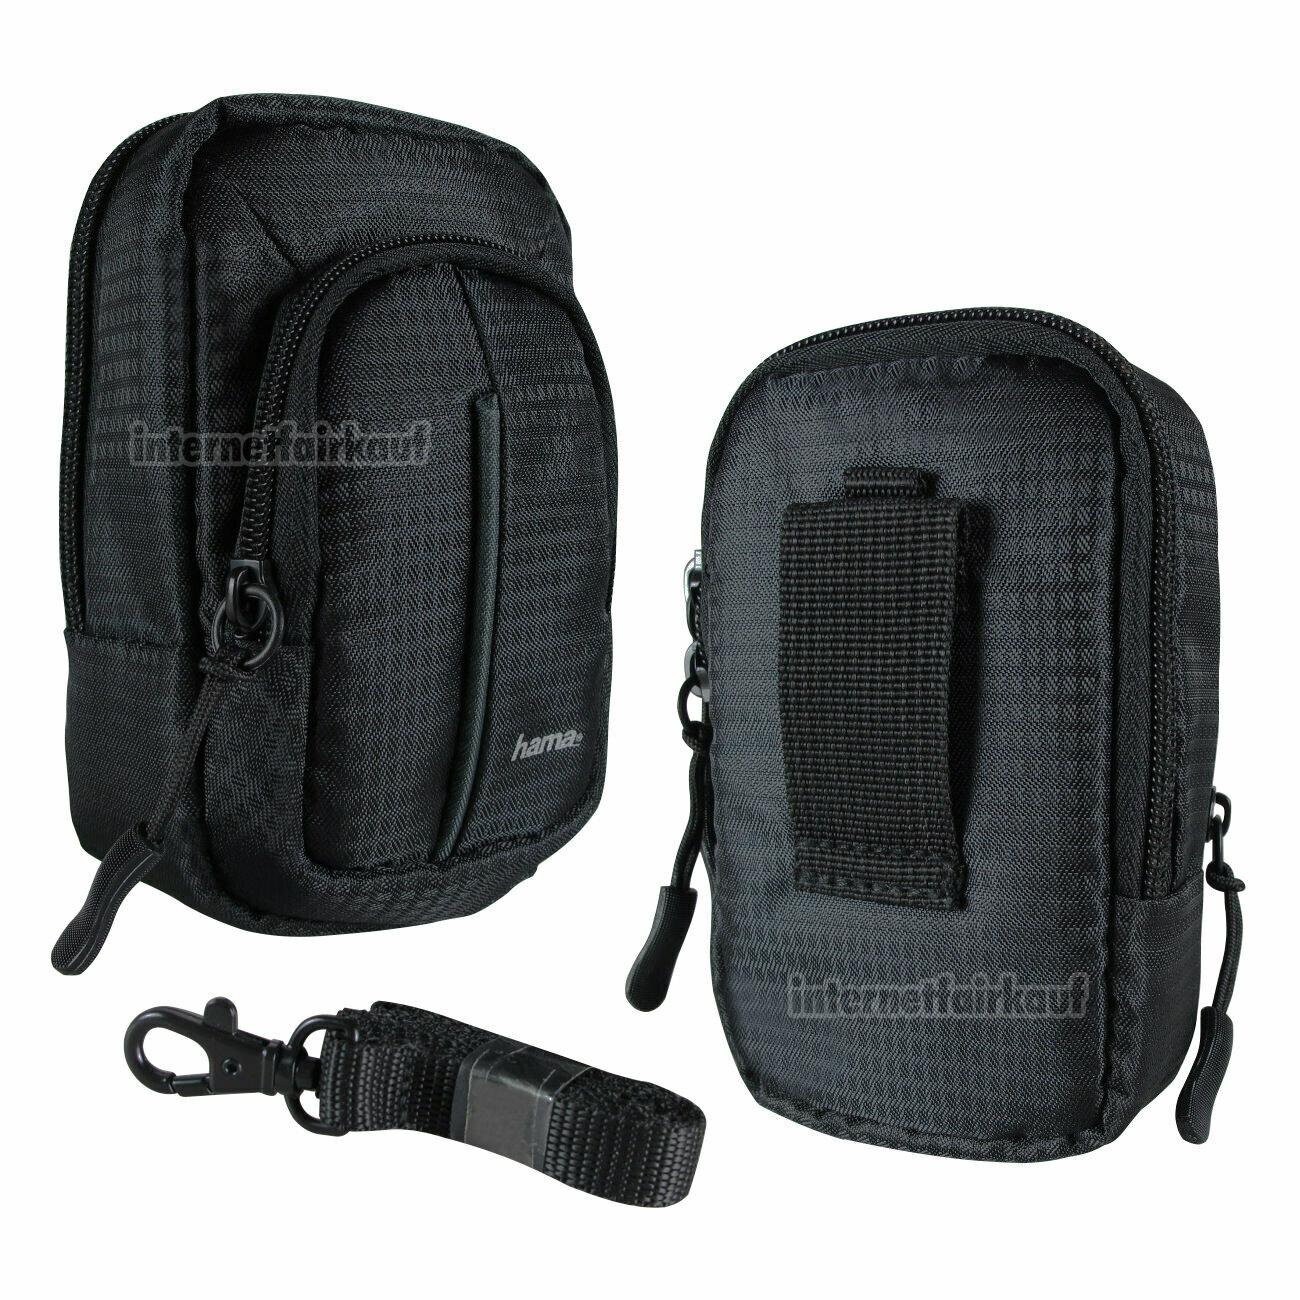 Fototasche schwarz passend für Panasonic DMC-TZ101 DMC-TZ81 DMC-TZ91